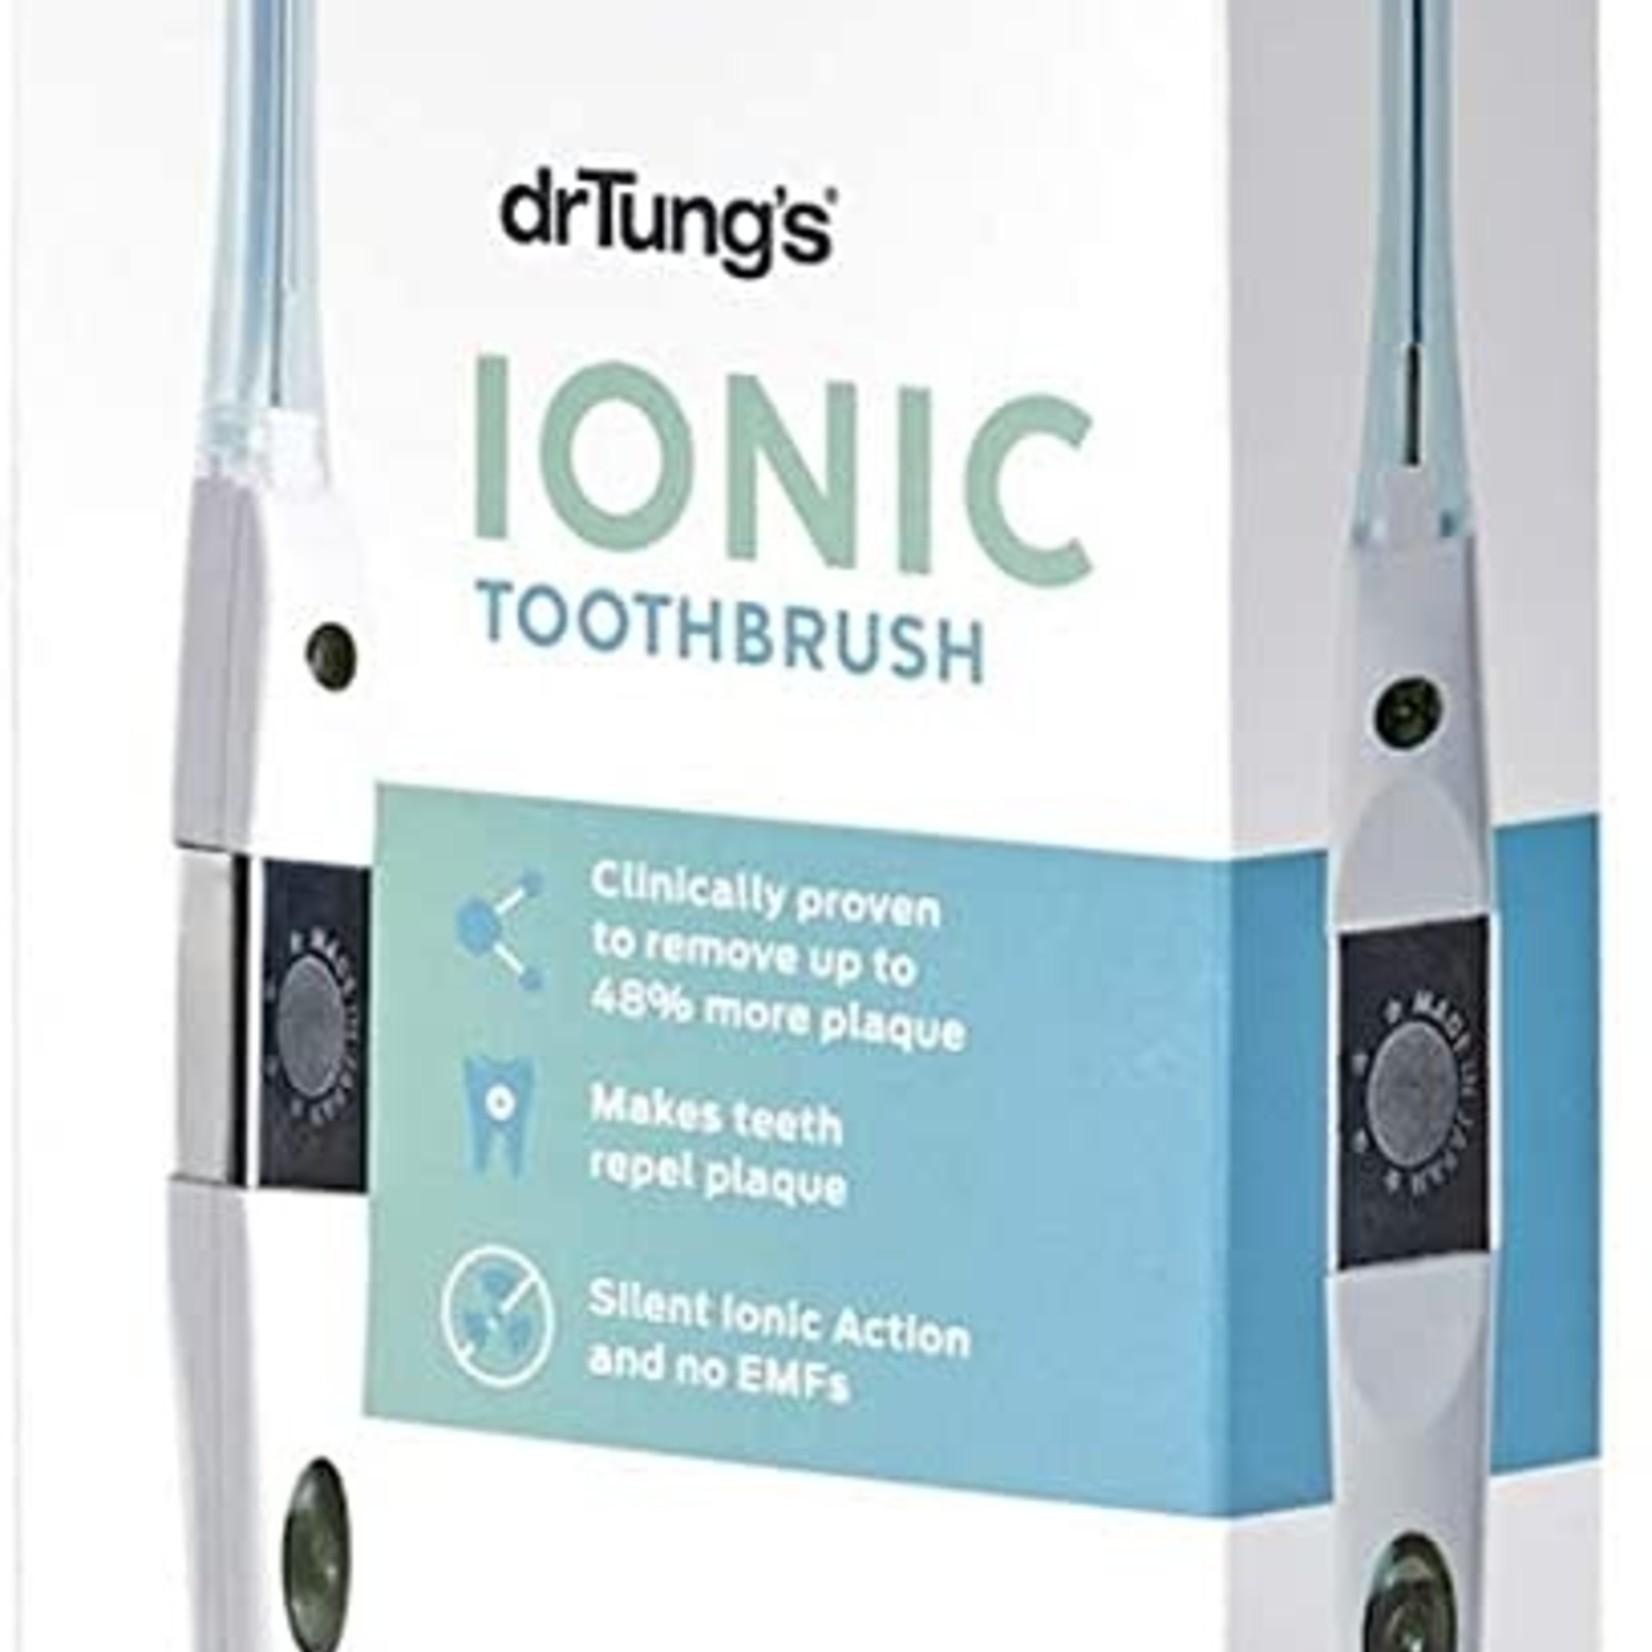 DrTung's Ionic Toothbrush